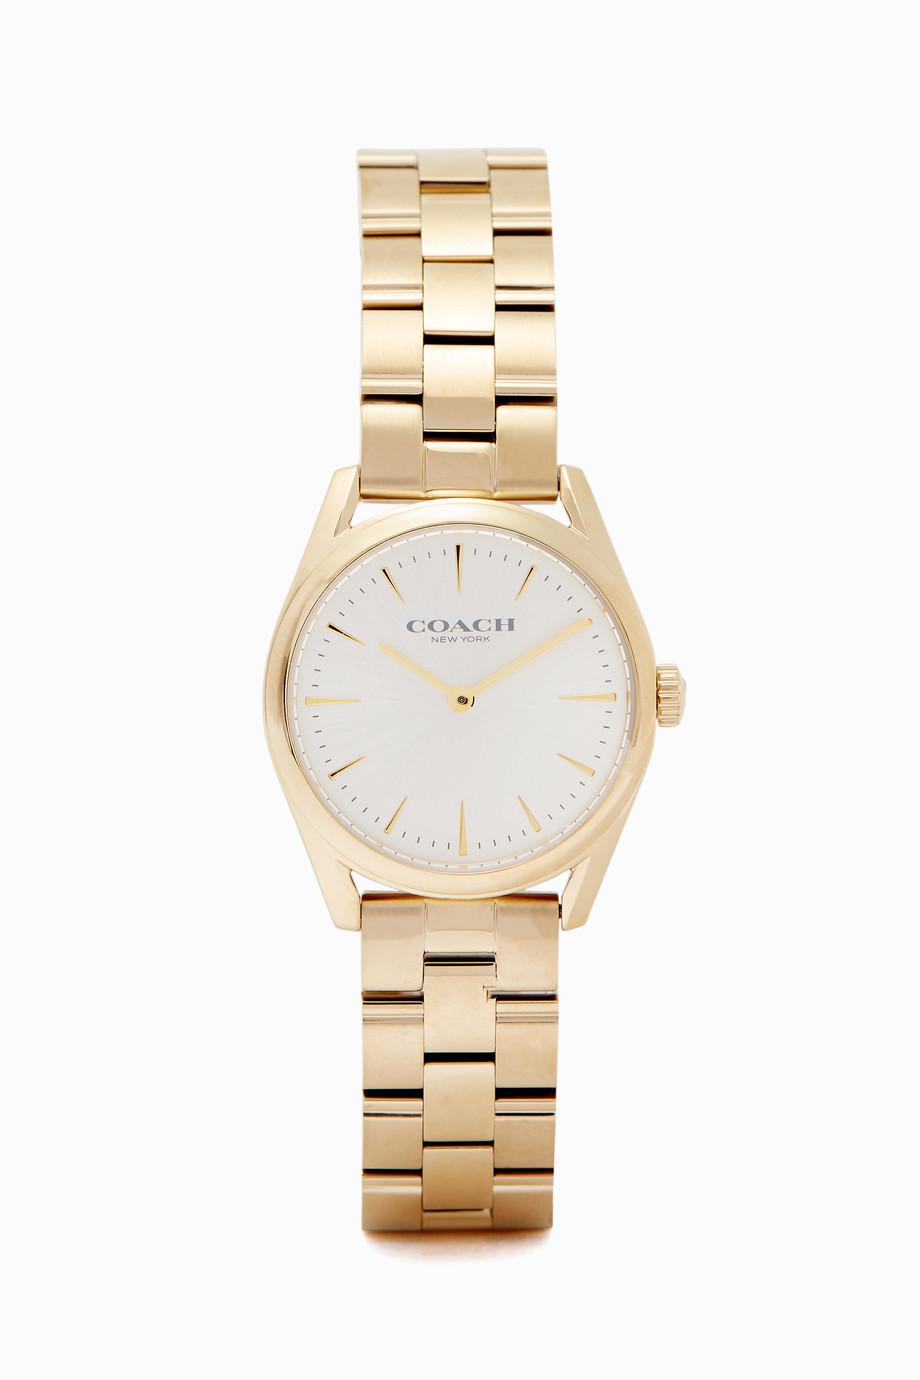 dbf5e9363 تسوق ساعة مودرن لاكجري ذهبية Coach ذهبي للنساء | اُناس الامارات